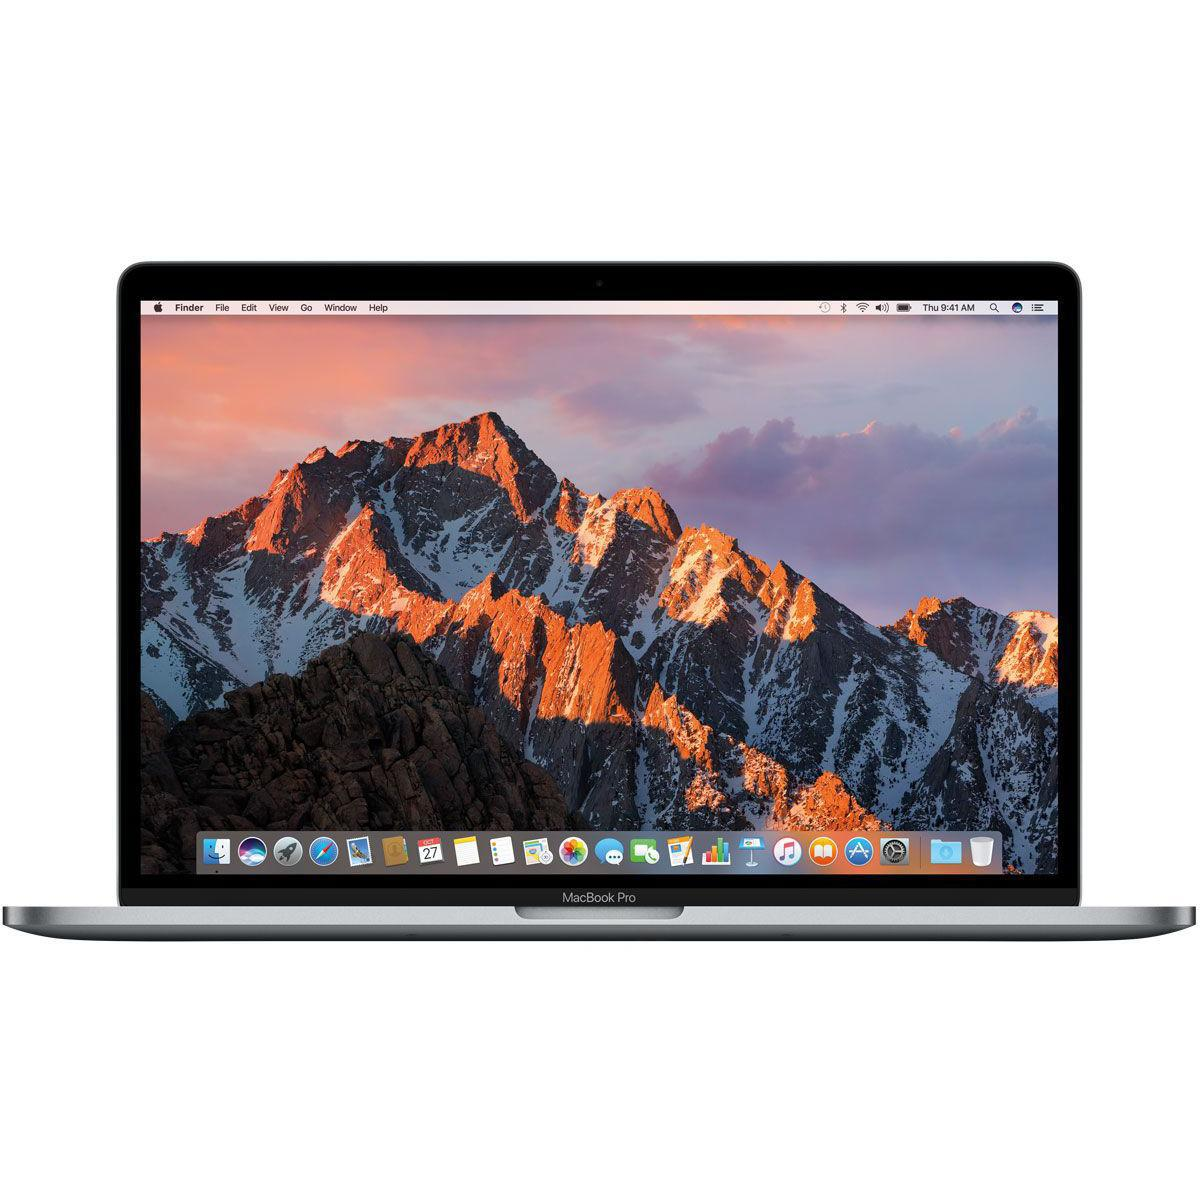 MacBook Pro Retina 15.4-inch (2018) - Core i9 - 32GB - SSD 512 GB